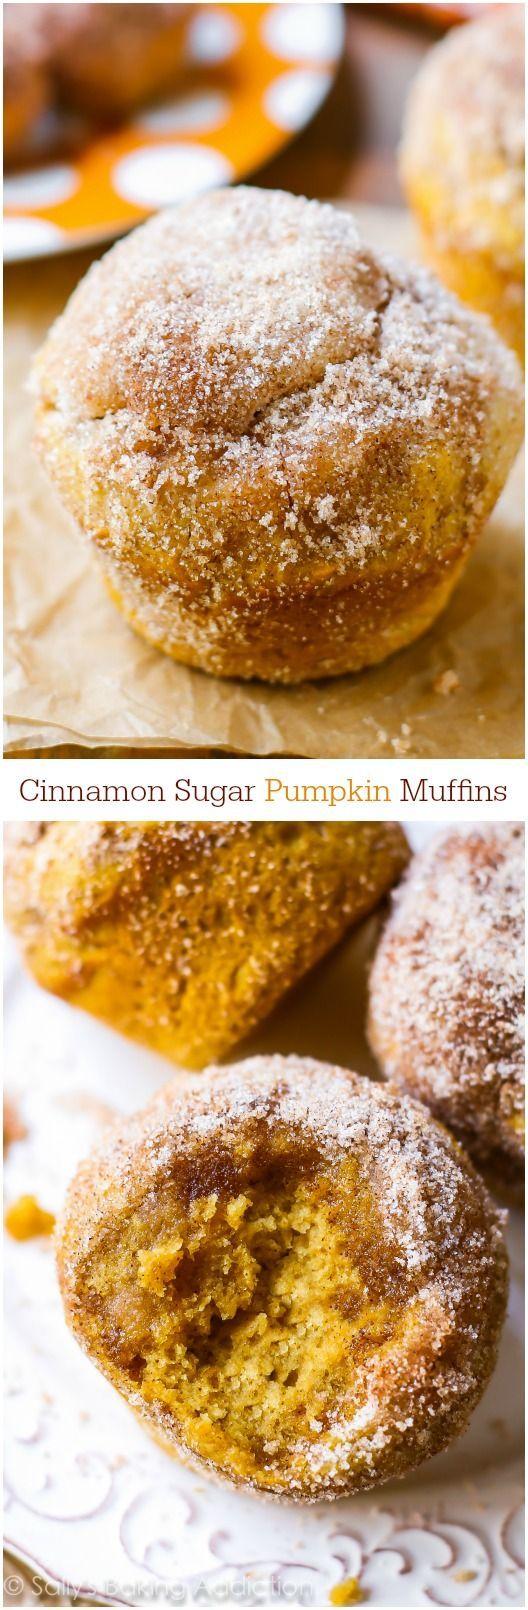 Love these bakery style Cinnamon-Sugar Pumpkin Muffins! I make this recipe year round.